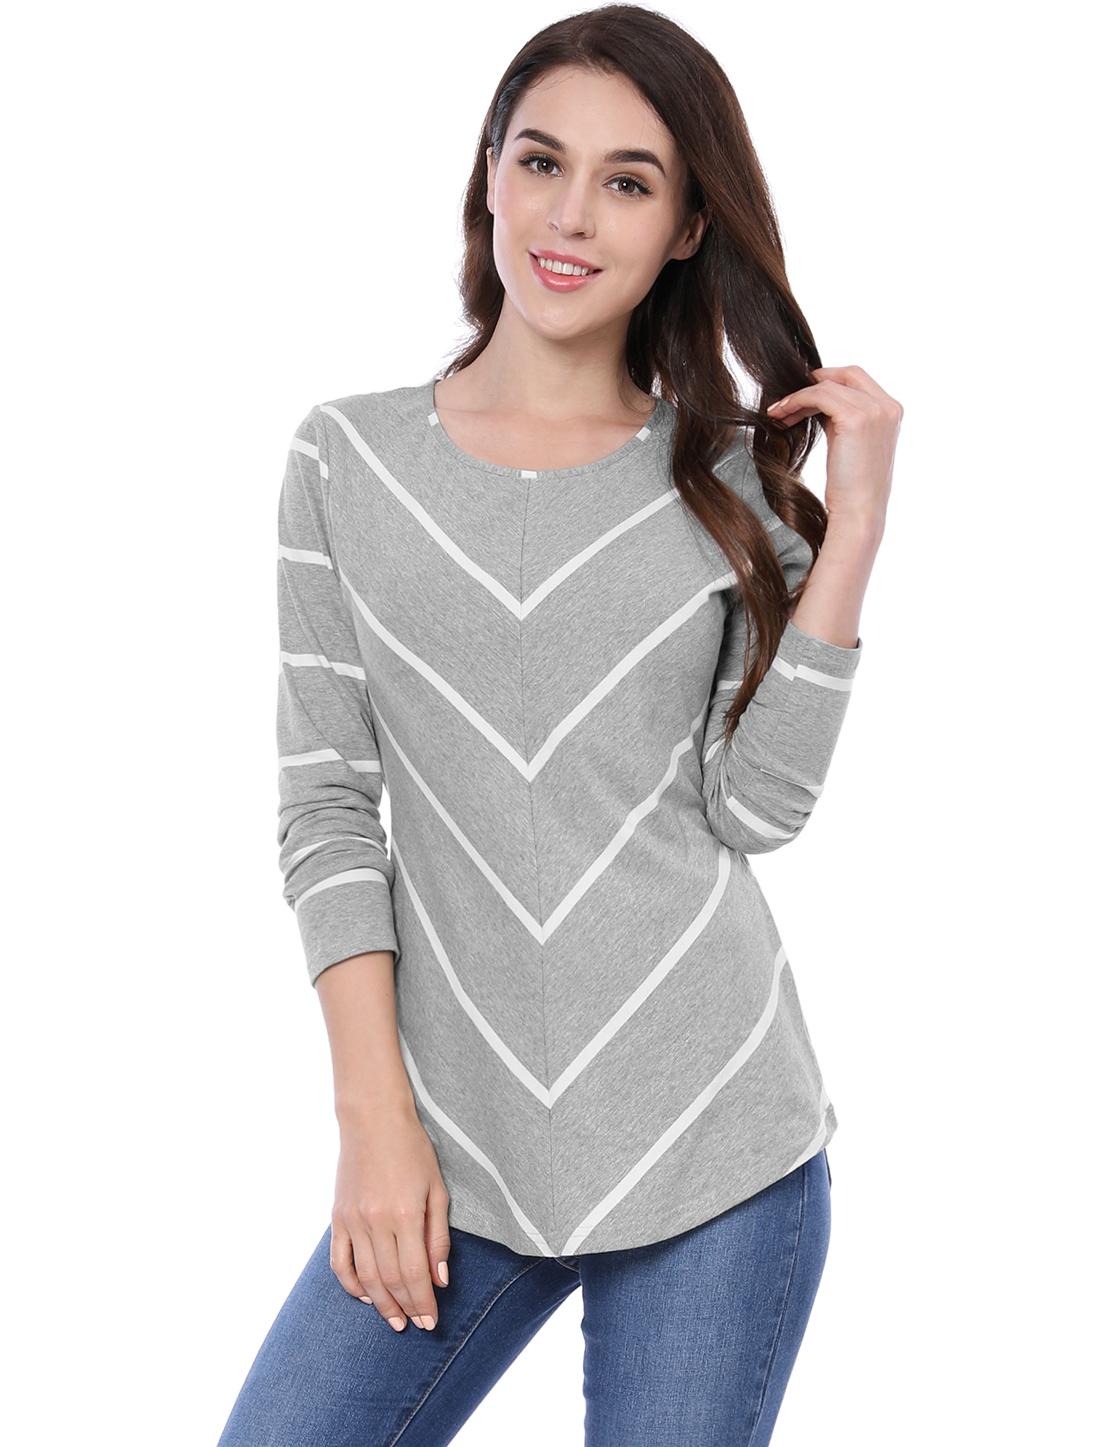 Women Long Sleeves Scoop Neck Striped Chevron Print Top Gray XS